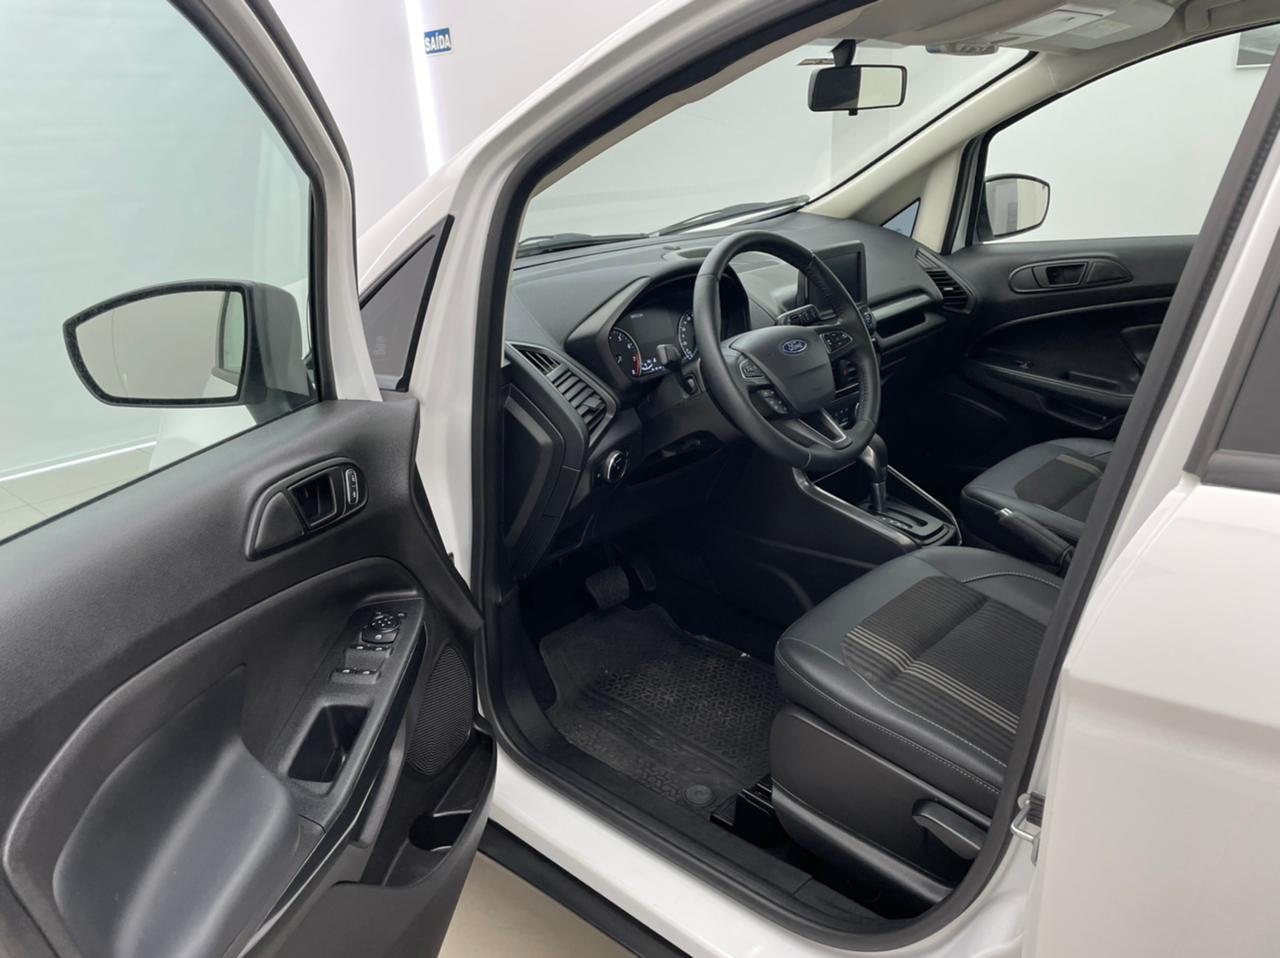 Ford-ECOSPORT-EcoSport FREESTYLE 1.5 12V Flex 5p Aut.